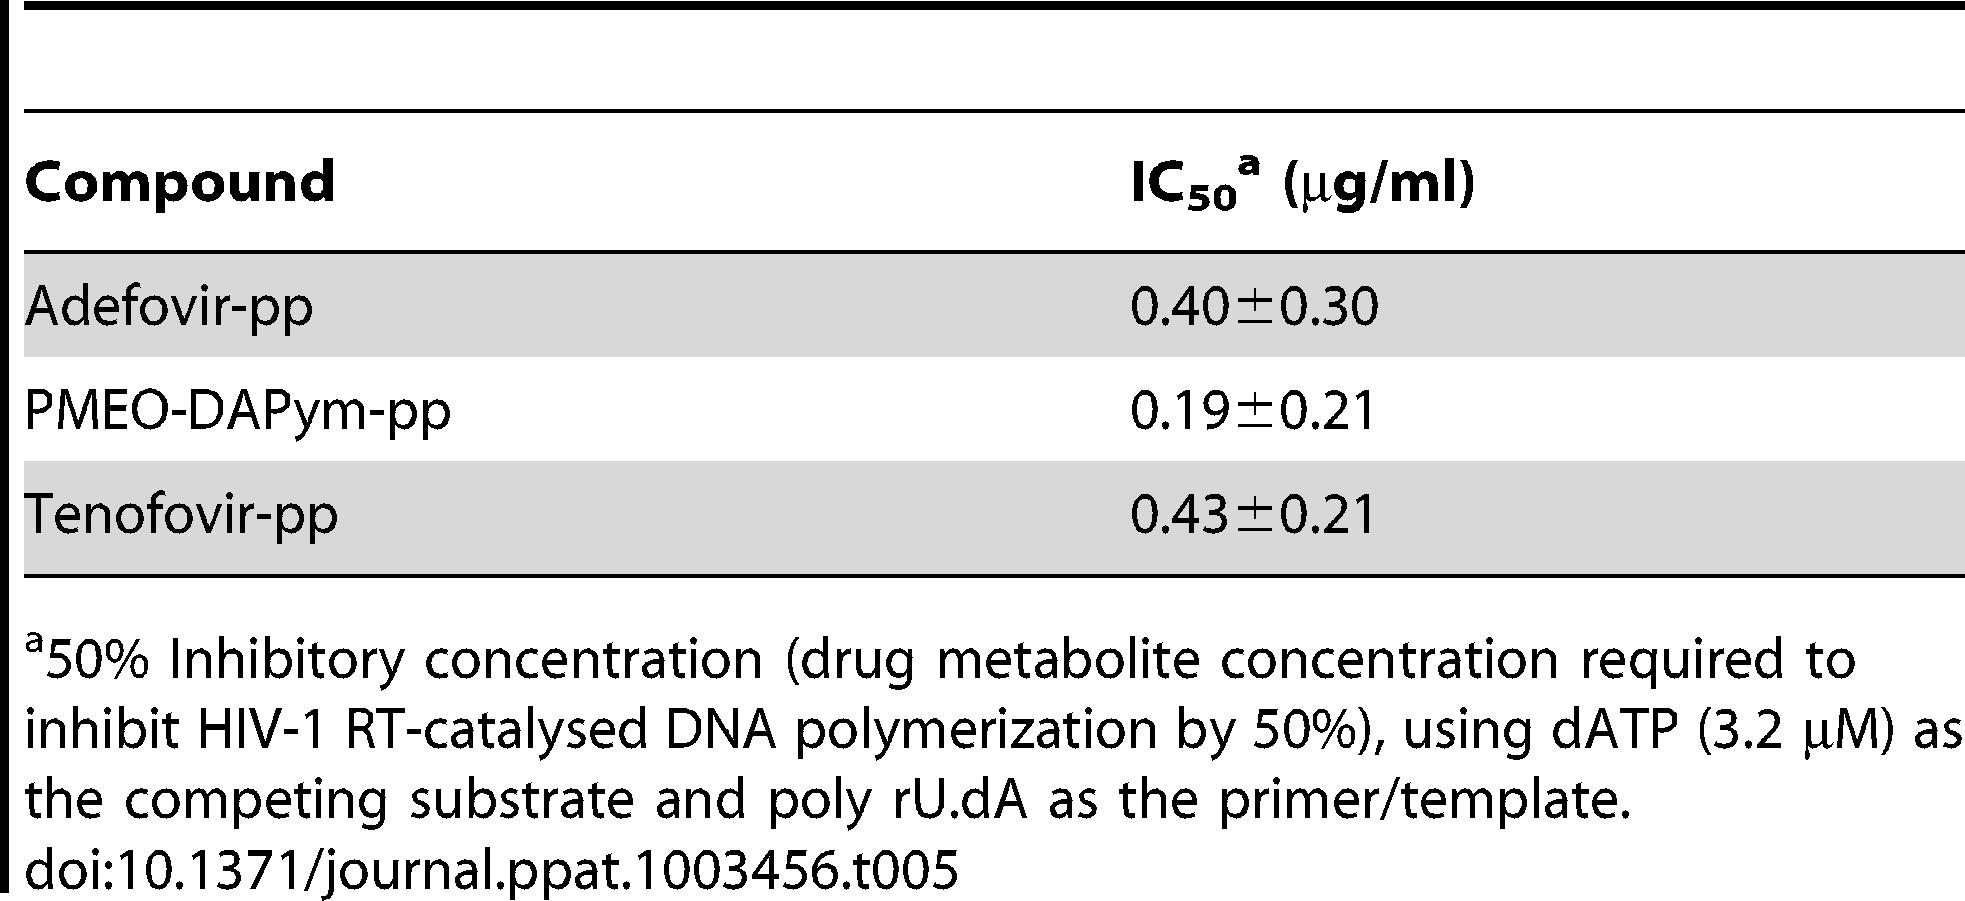 Inhibitory activity of the diphosphate metabolites of adefovir, tenofovir, and PMEO-DAPym against HIV-1 RT.